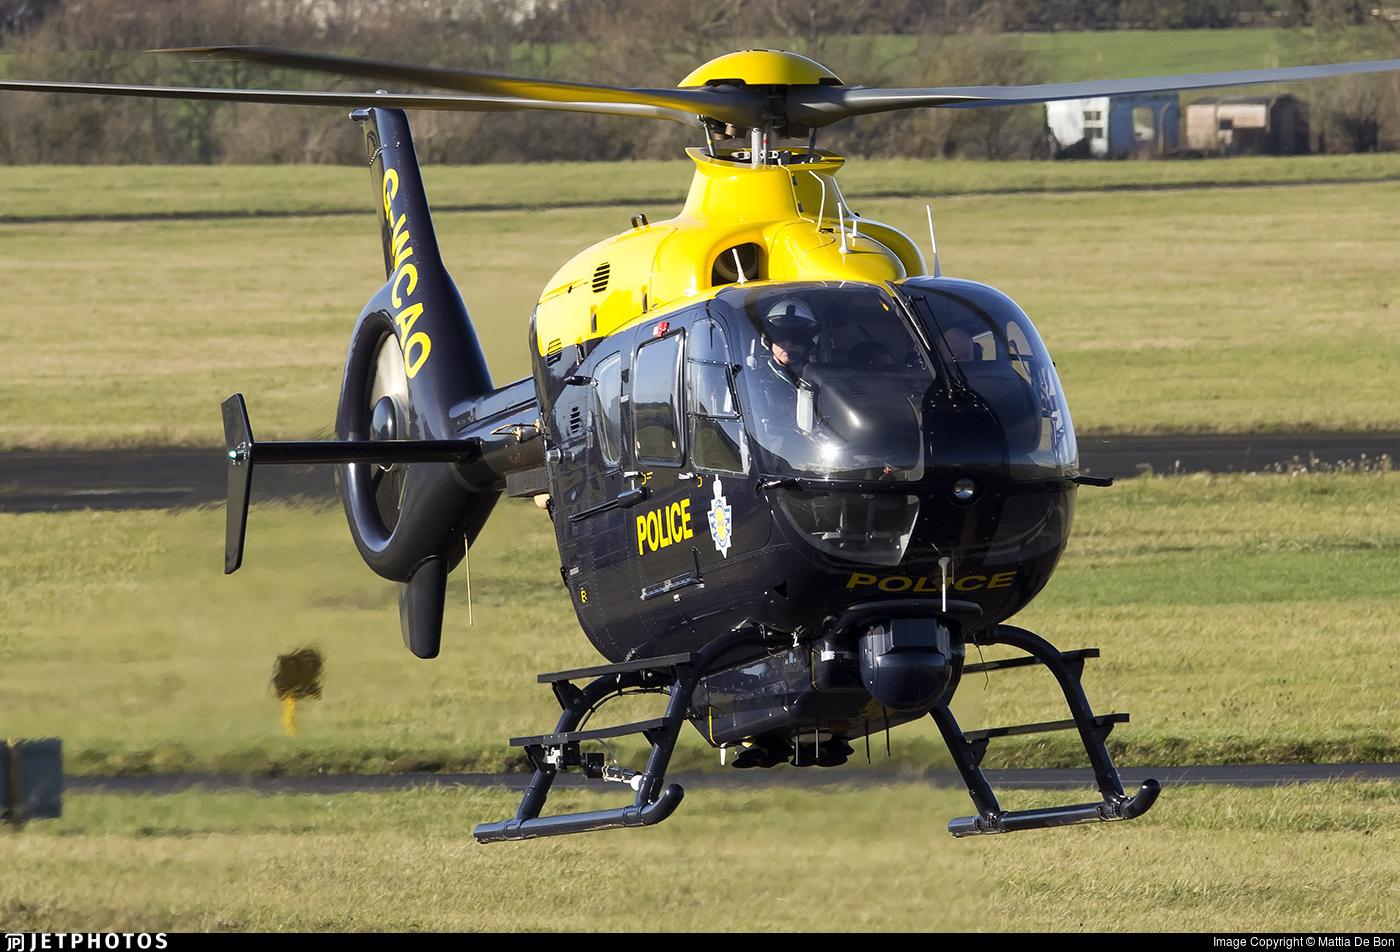 G-WCAO - Eurocopter EC 135T2 - United Kingdom - Police